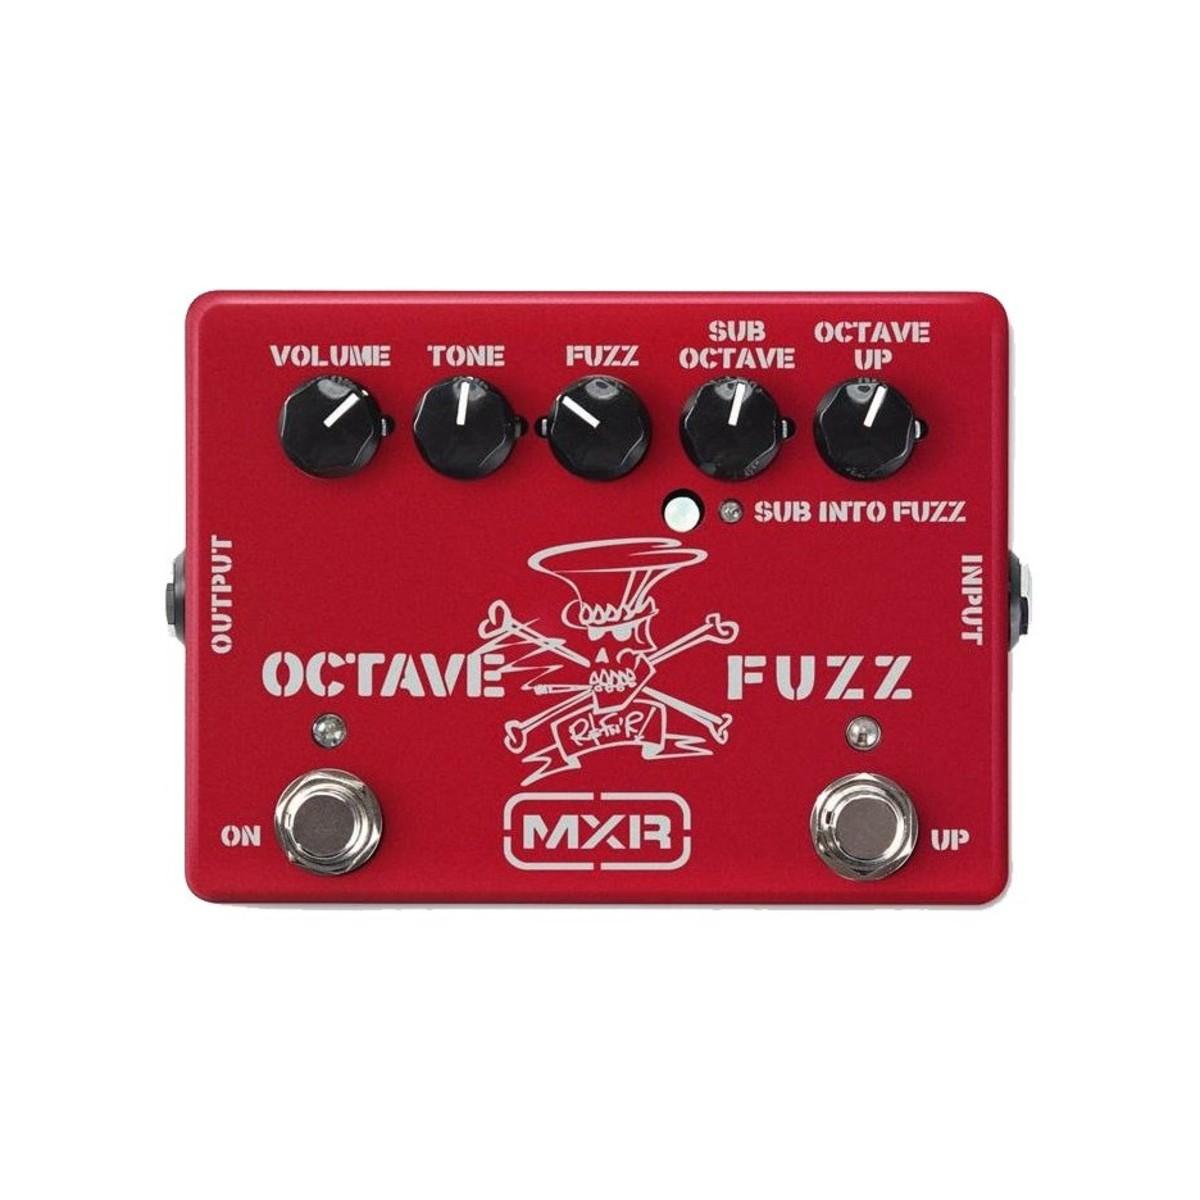 Mxr Sf01r Slash Octave Fuzz Ltd Ruby Red At Gear4music Octaver Guitar Effects